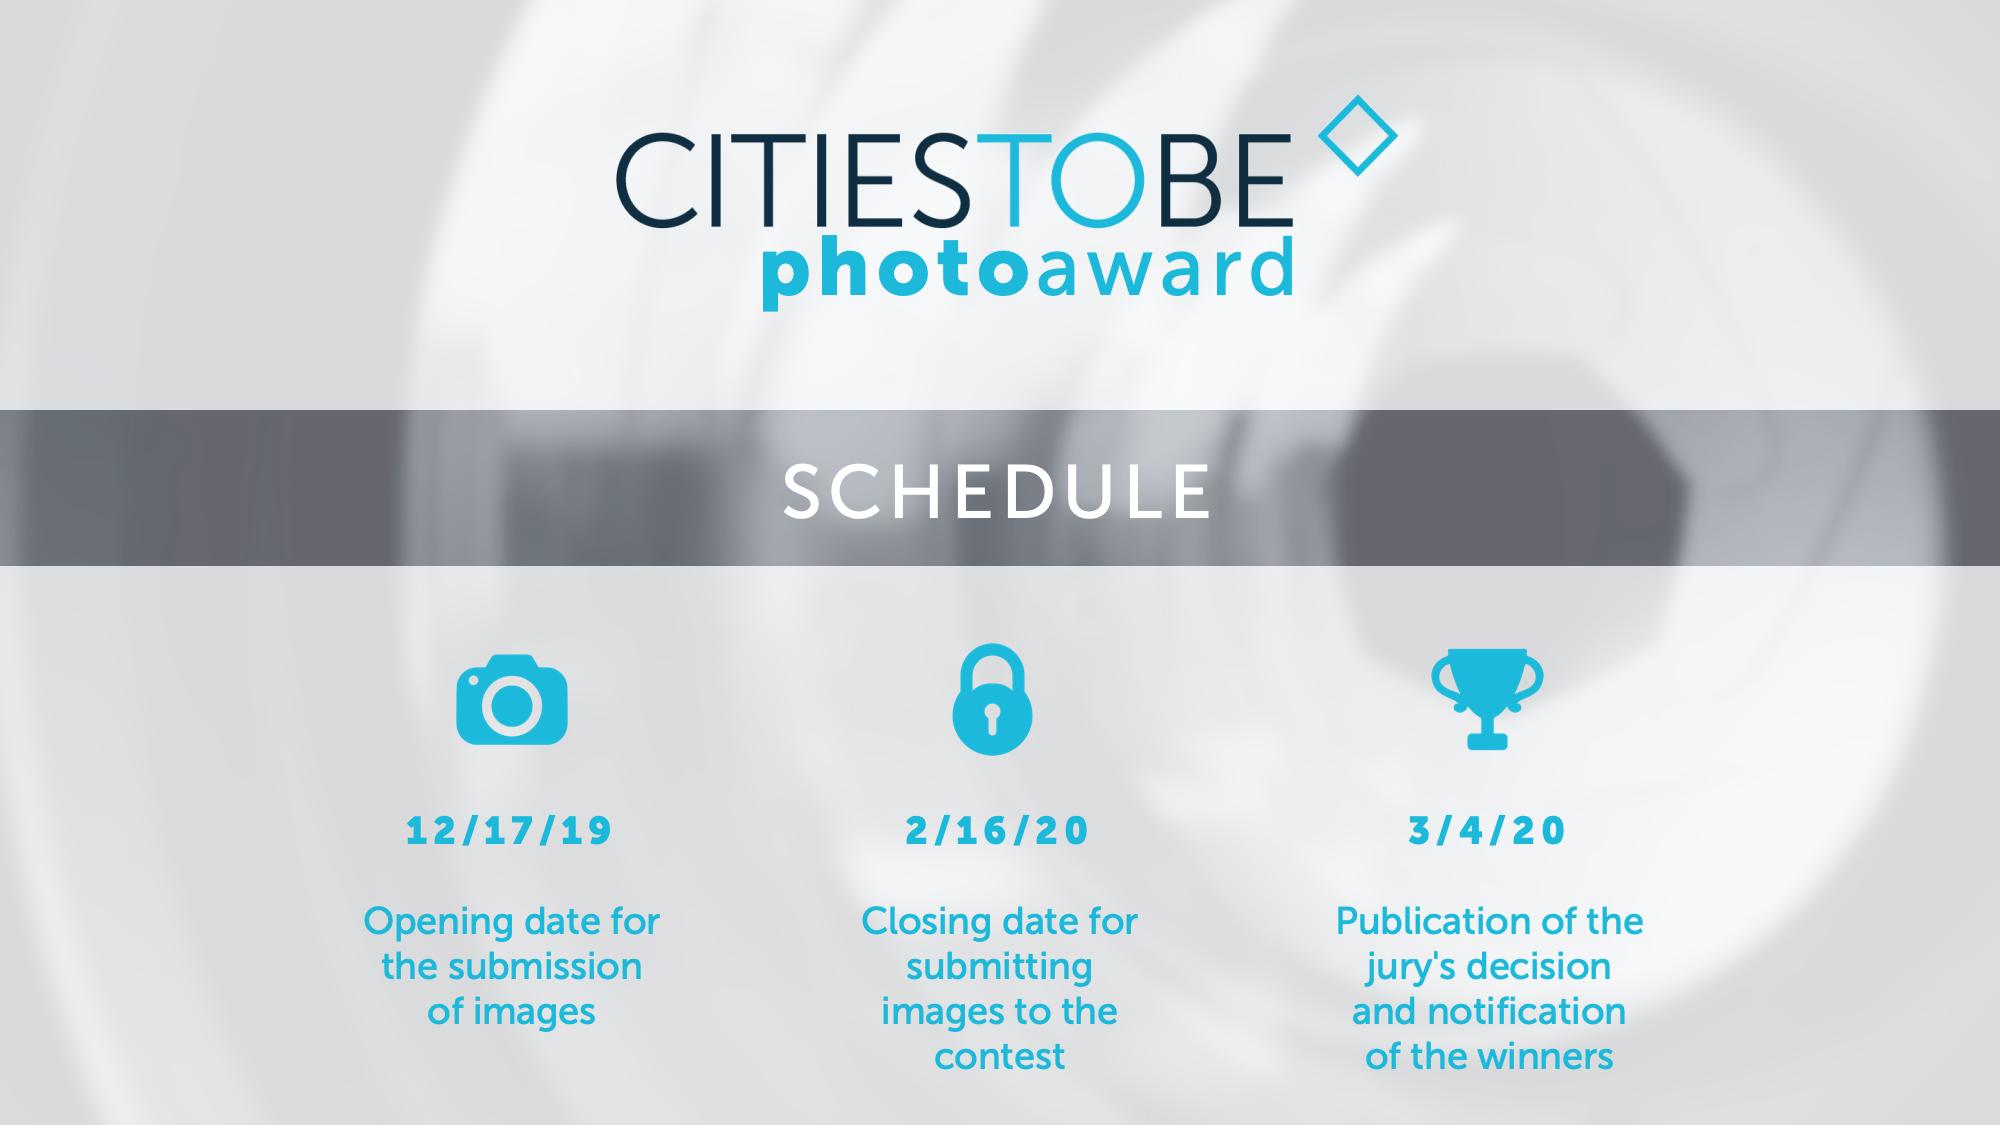 CitiesToBe Photo Award Schedule